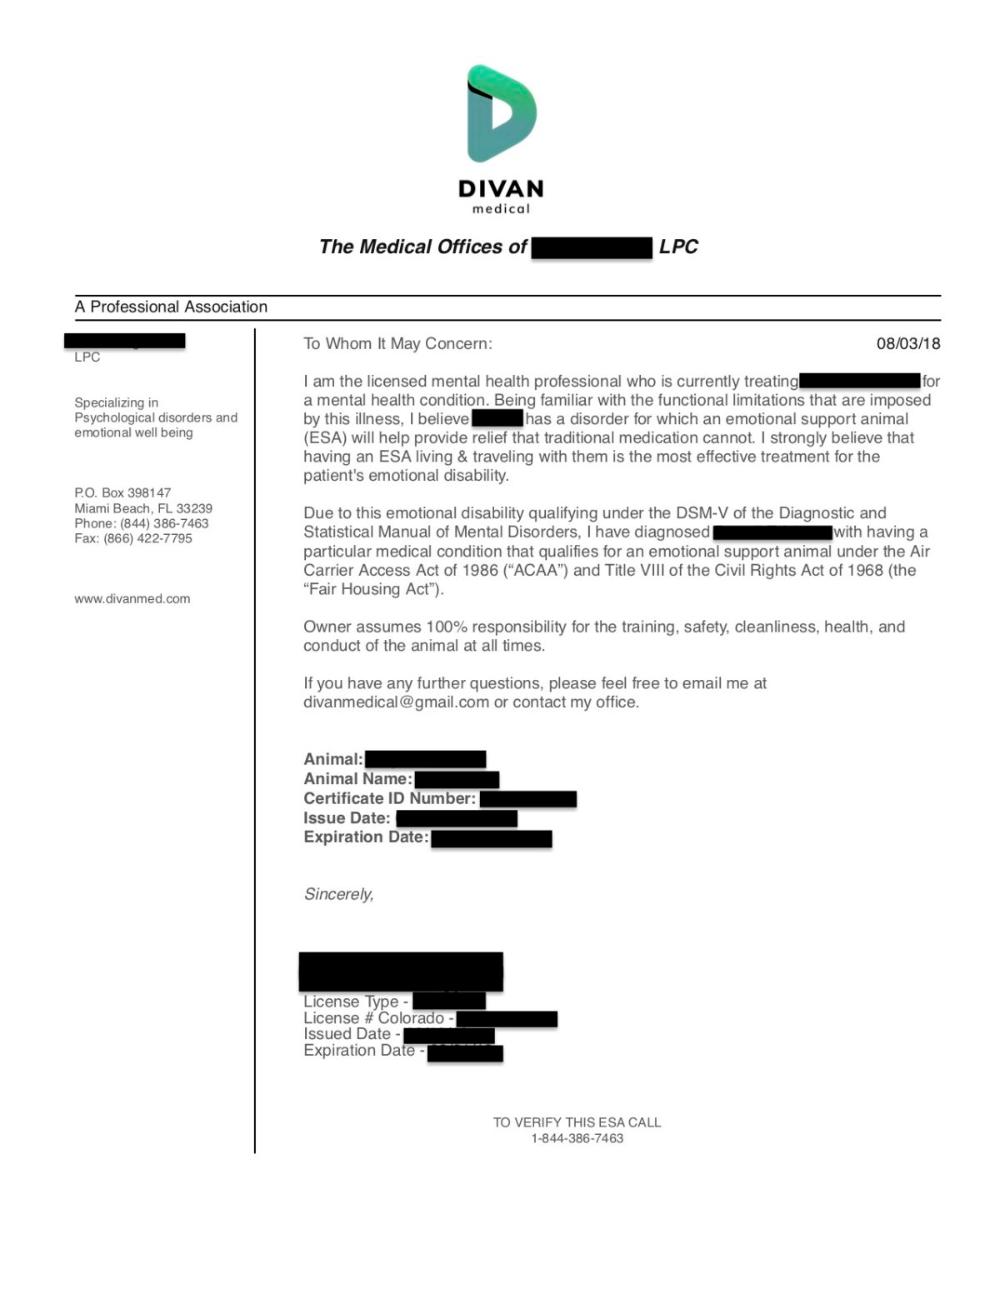 Mooshme Is My ESA Letter Legitimate? ESA Letter Online